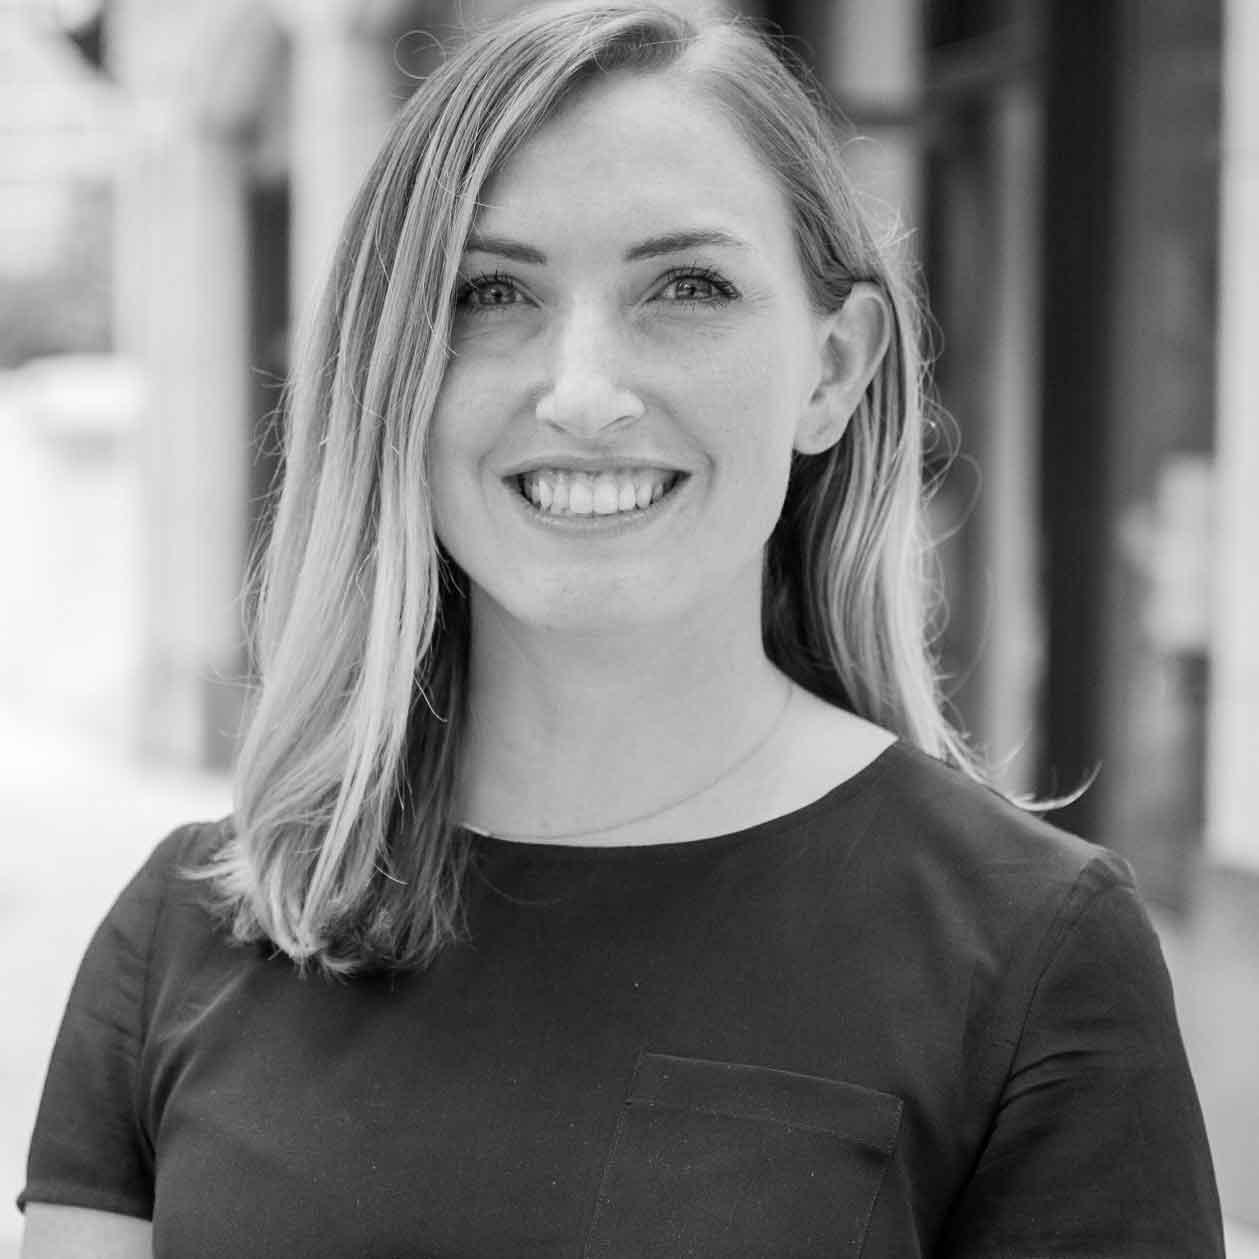 Emily Marsh • Oakland, CA  Master in Urban Planning '18 • Harvard Graduate School of Design